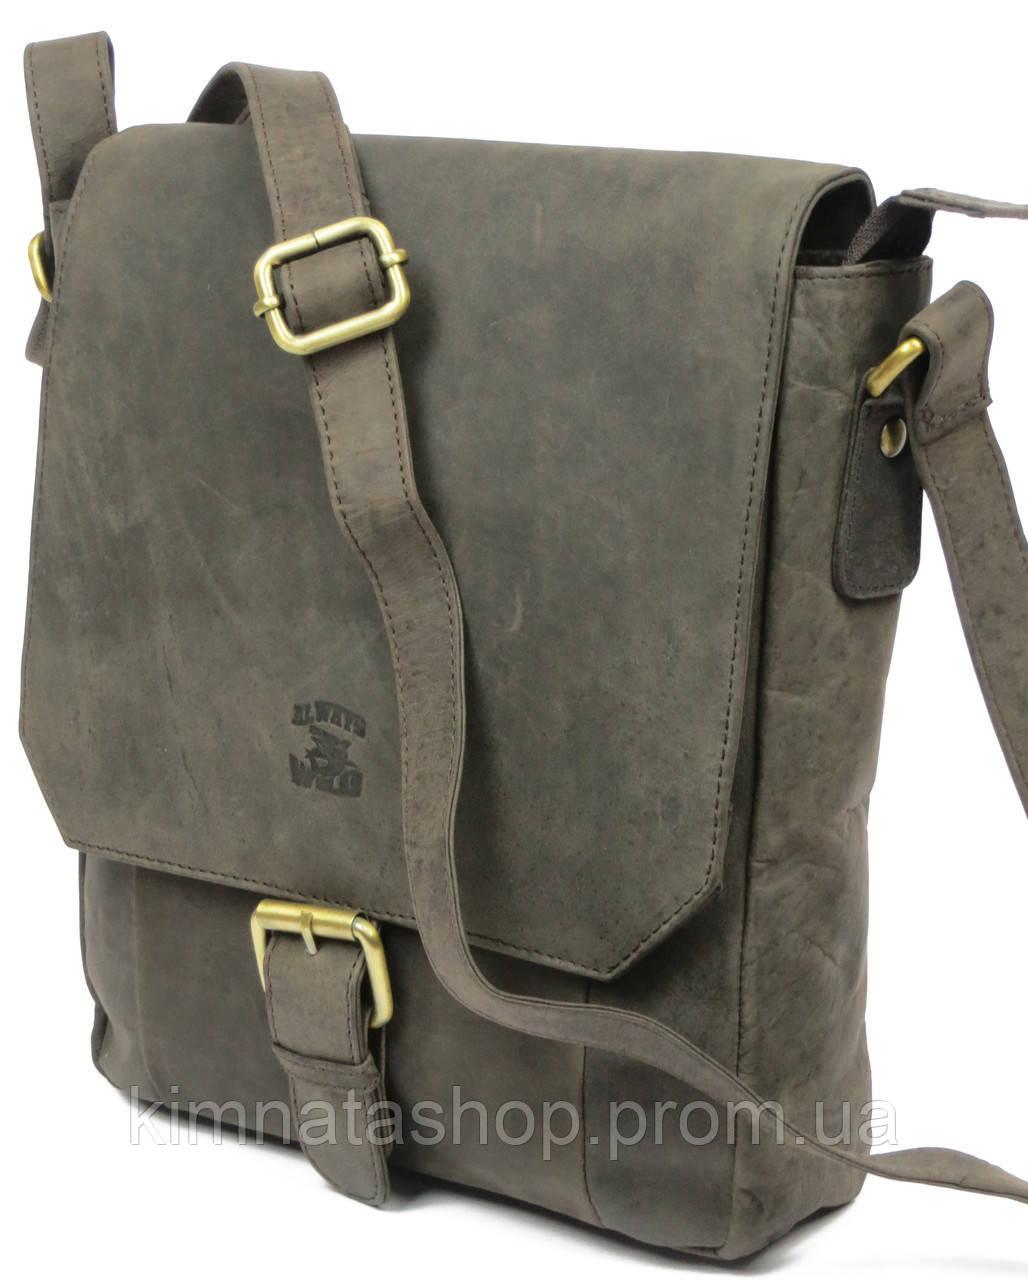 Кожаная сумка-плантешка Always Wild С48.0163 коричневая